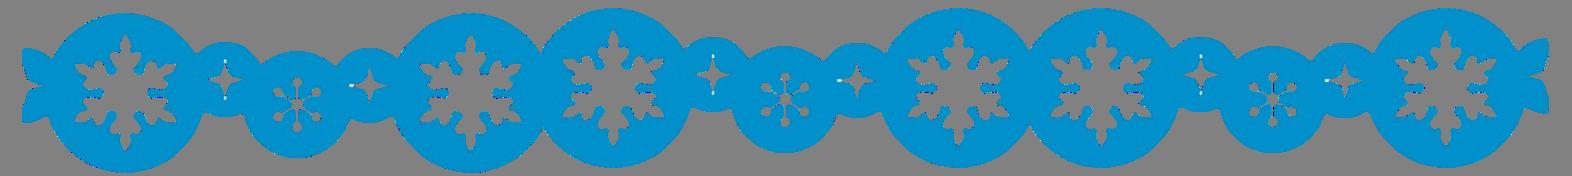 snowflake-border-clip-art-snowflakesborder.jpg.png